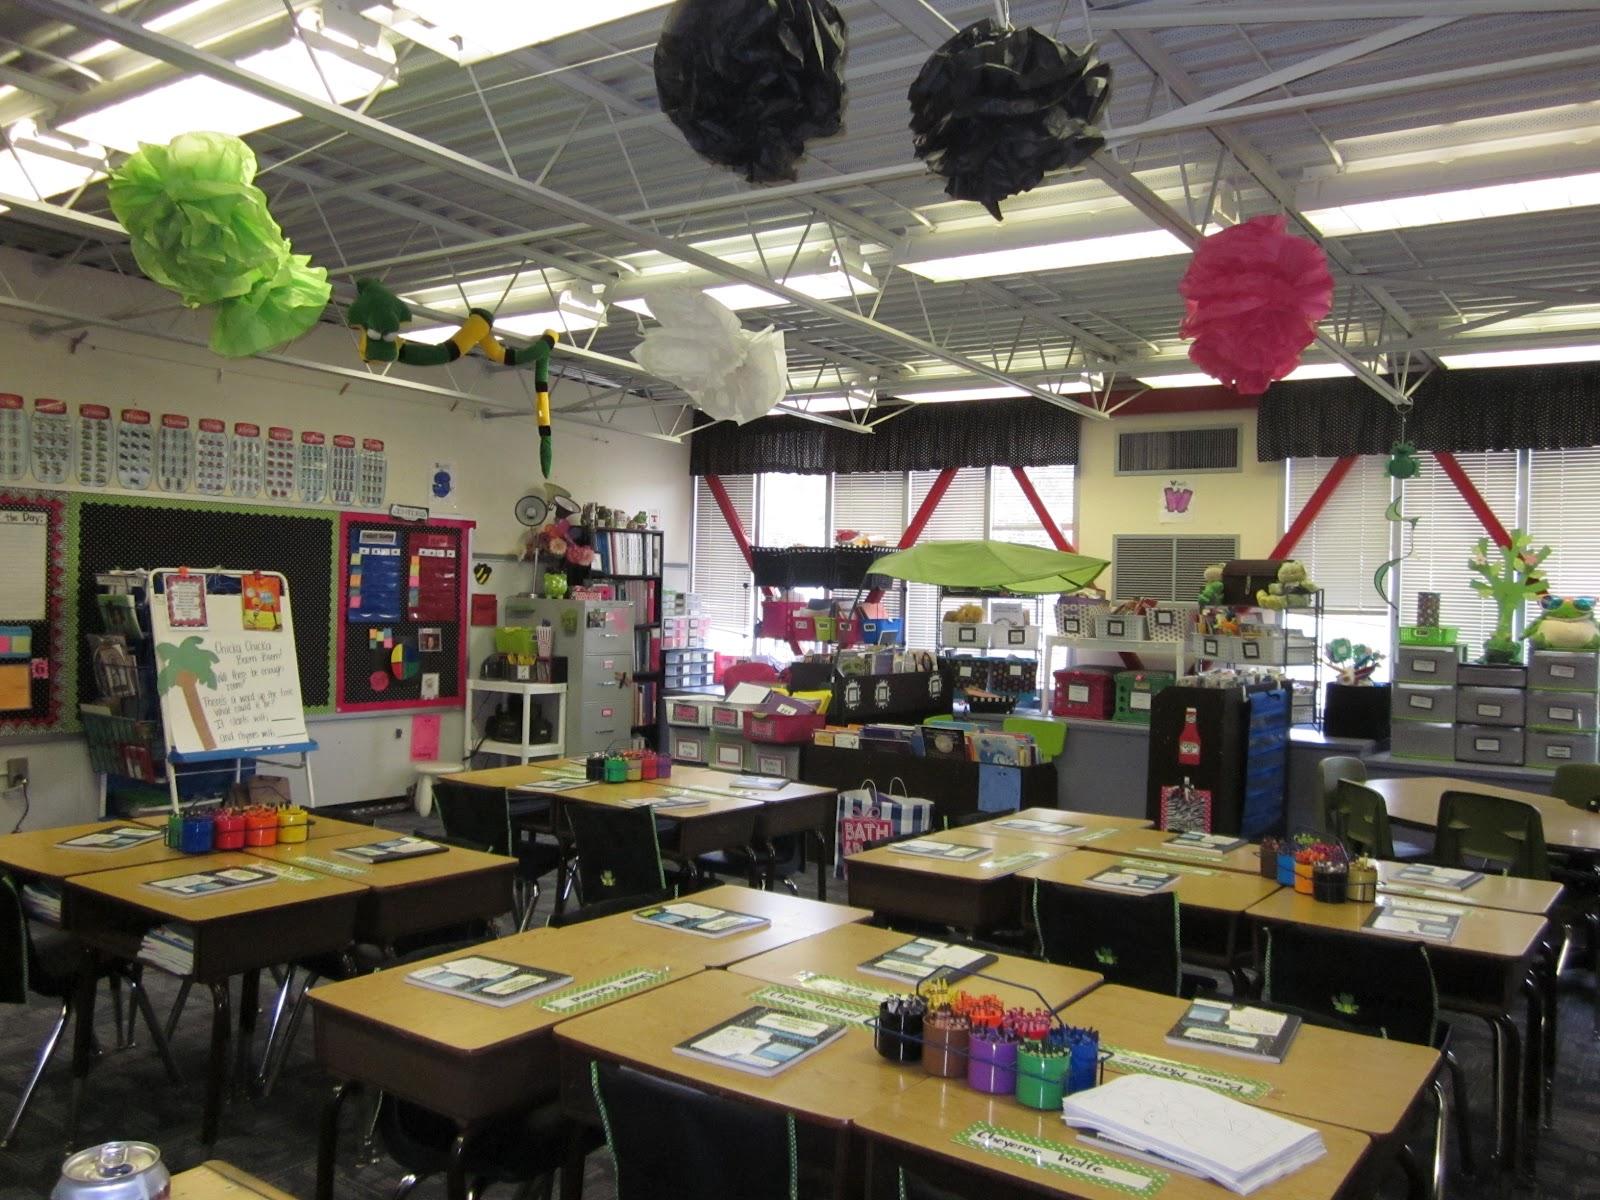 Classroom Decor Chevron ~ First grade fairytales classroom decor linky chevron a